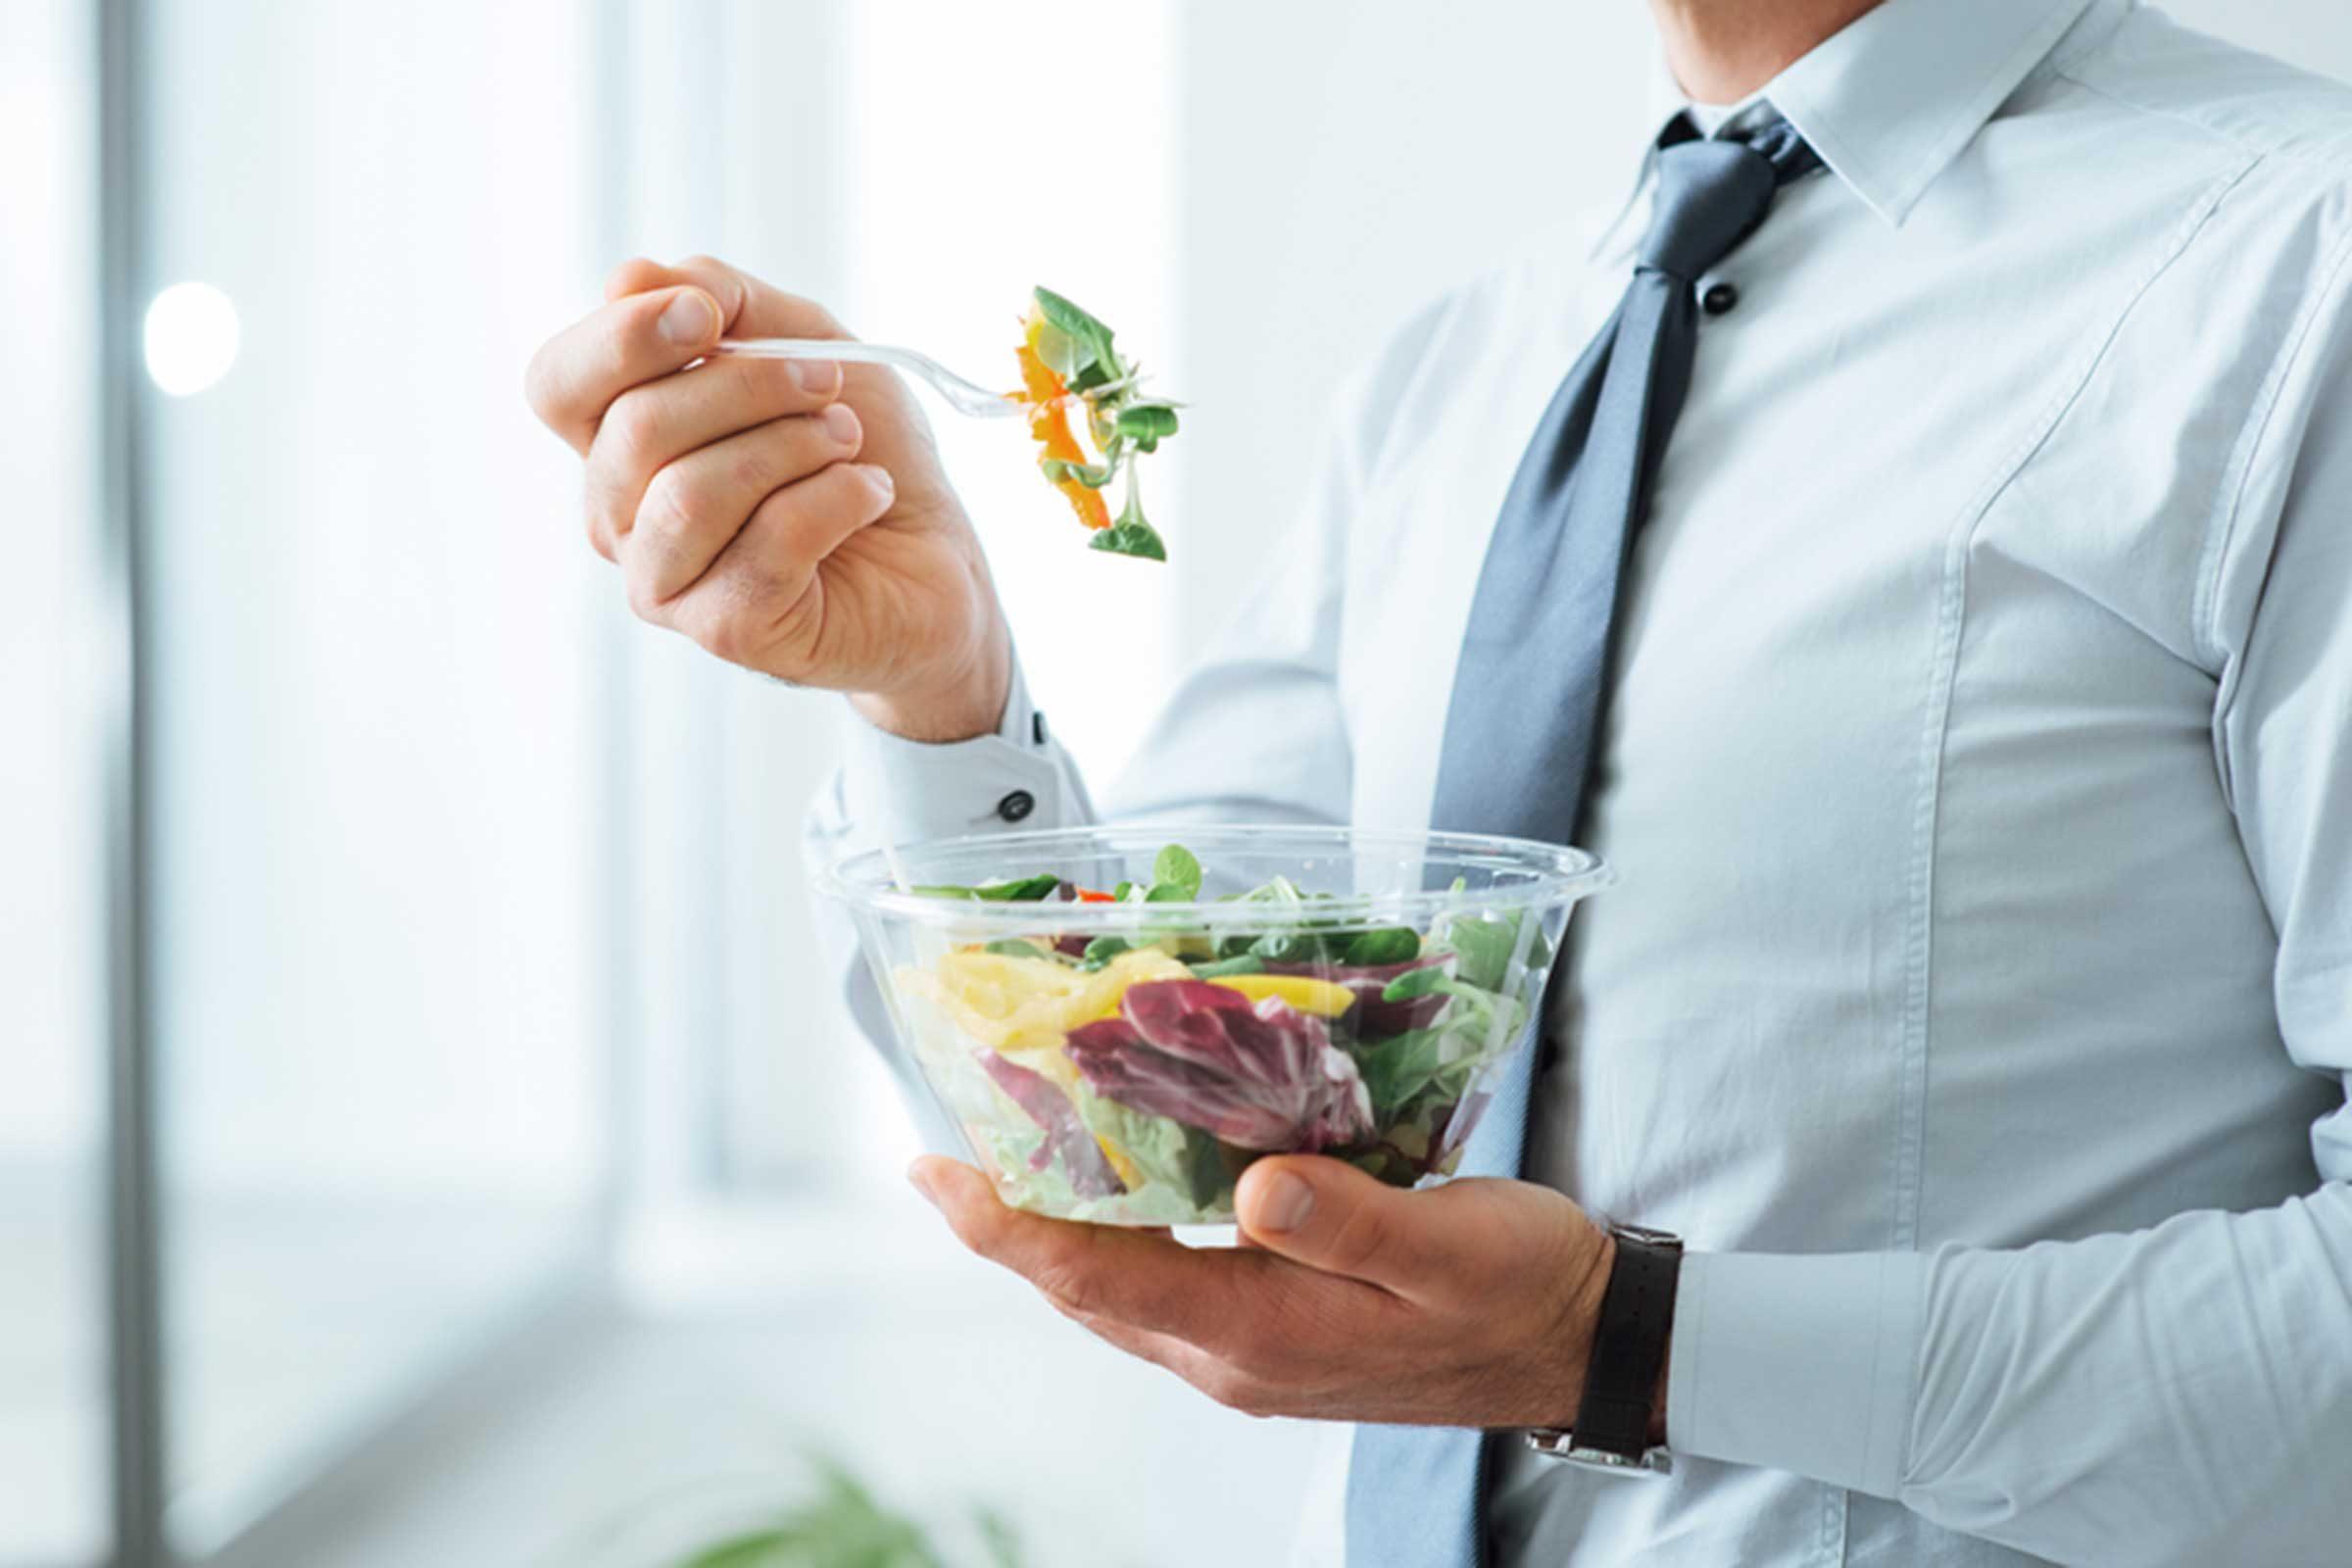 Man holding salad bowl